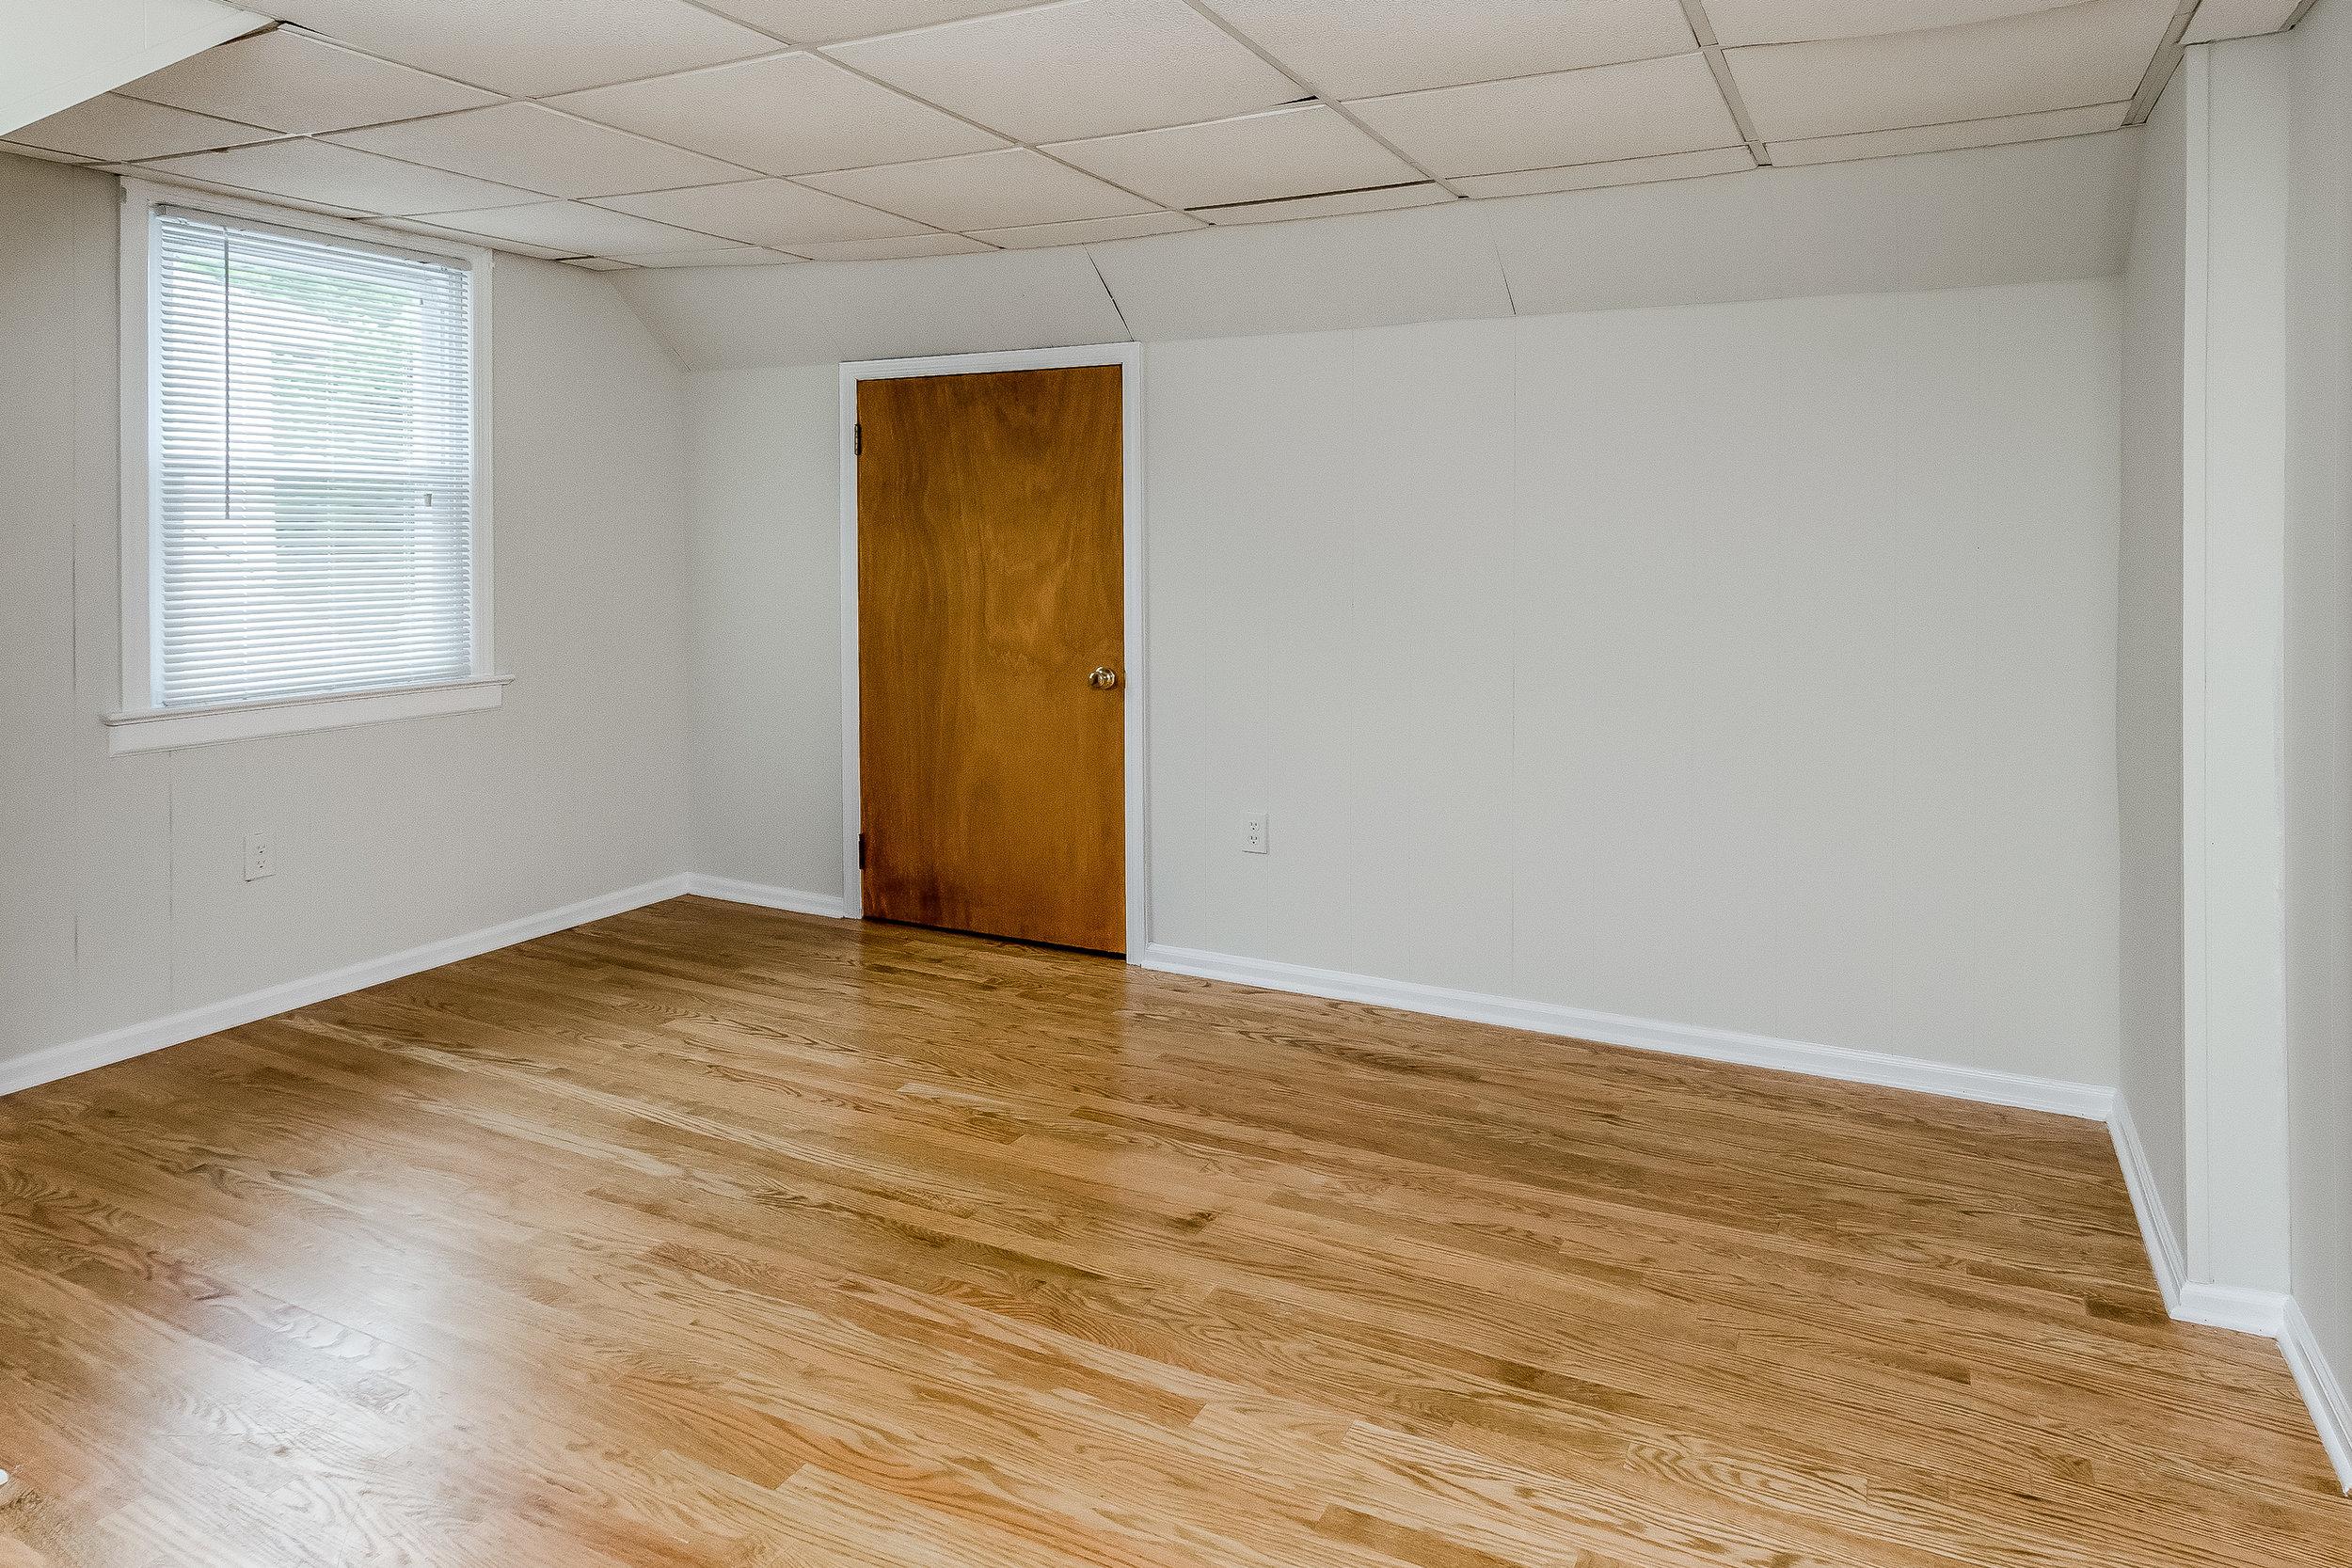 027-photo-bedroom-5786565.jpg